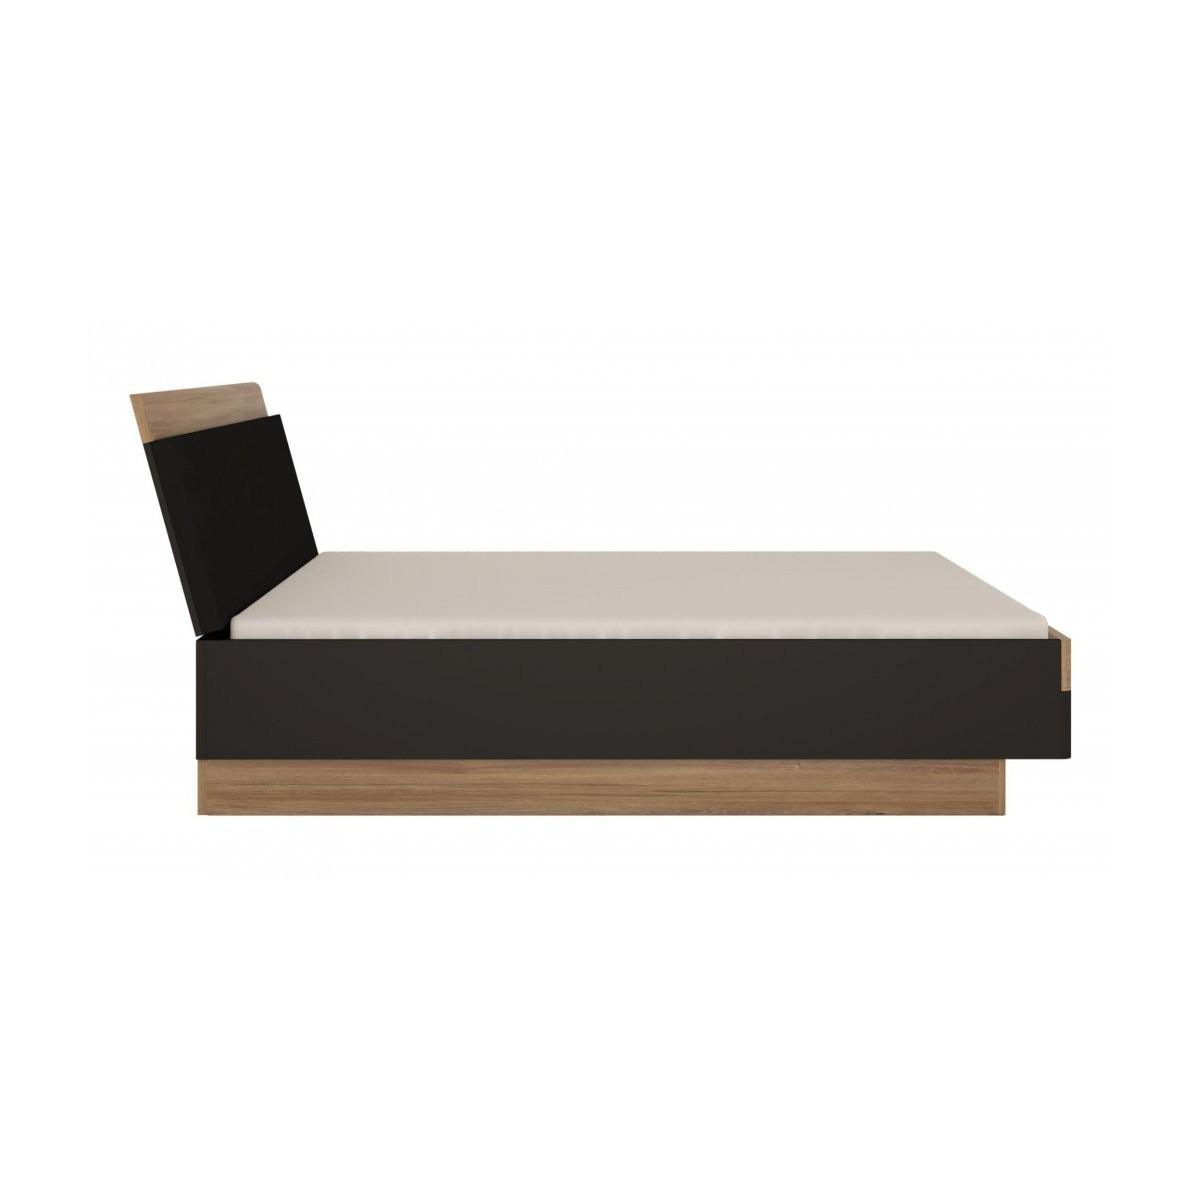 Łóżko 140 cm Dąb Stirling / Czarny Mat Monaco MOAL01